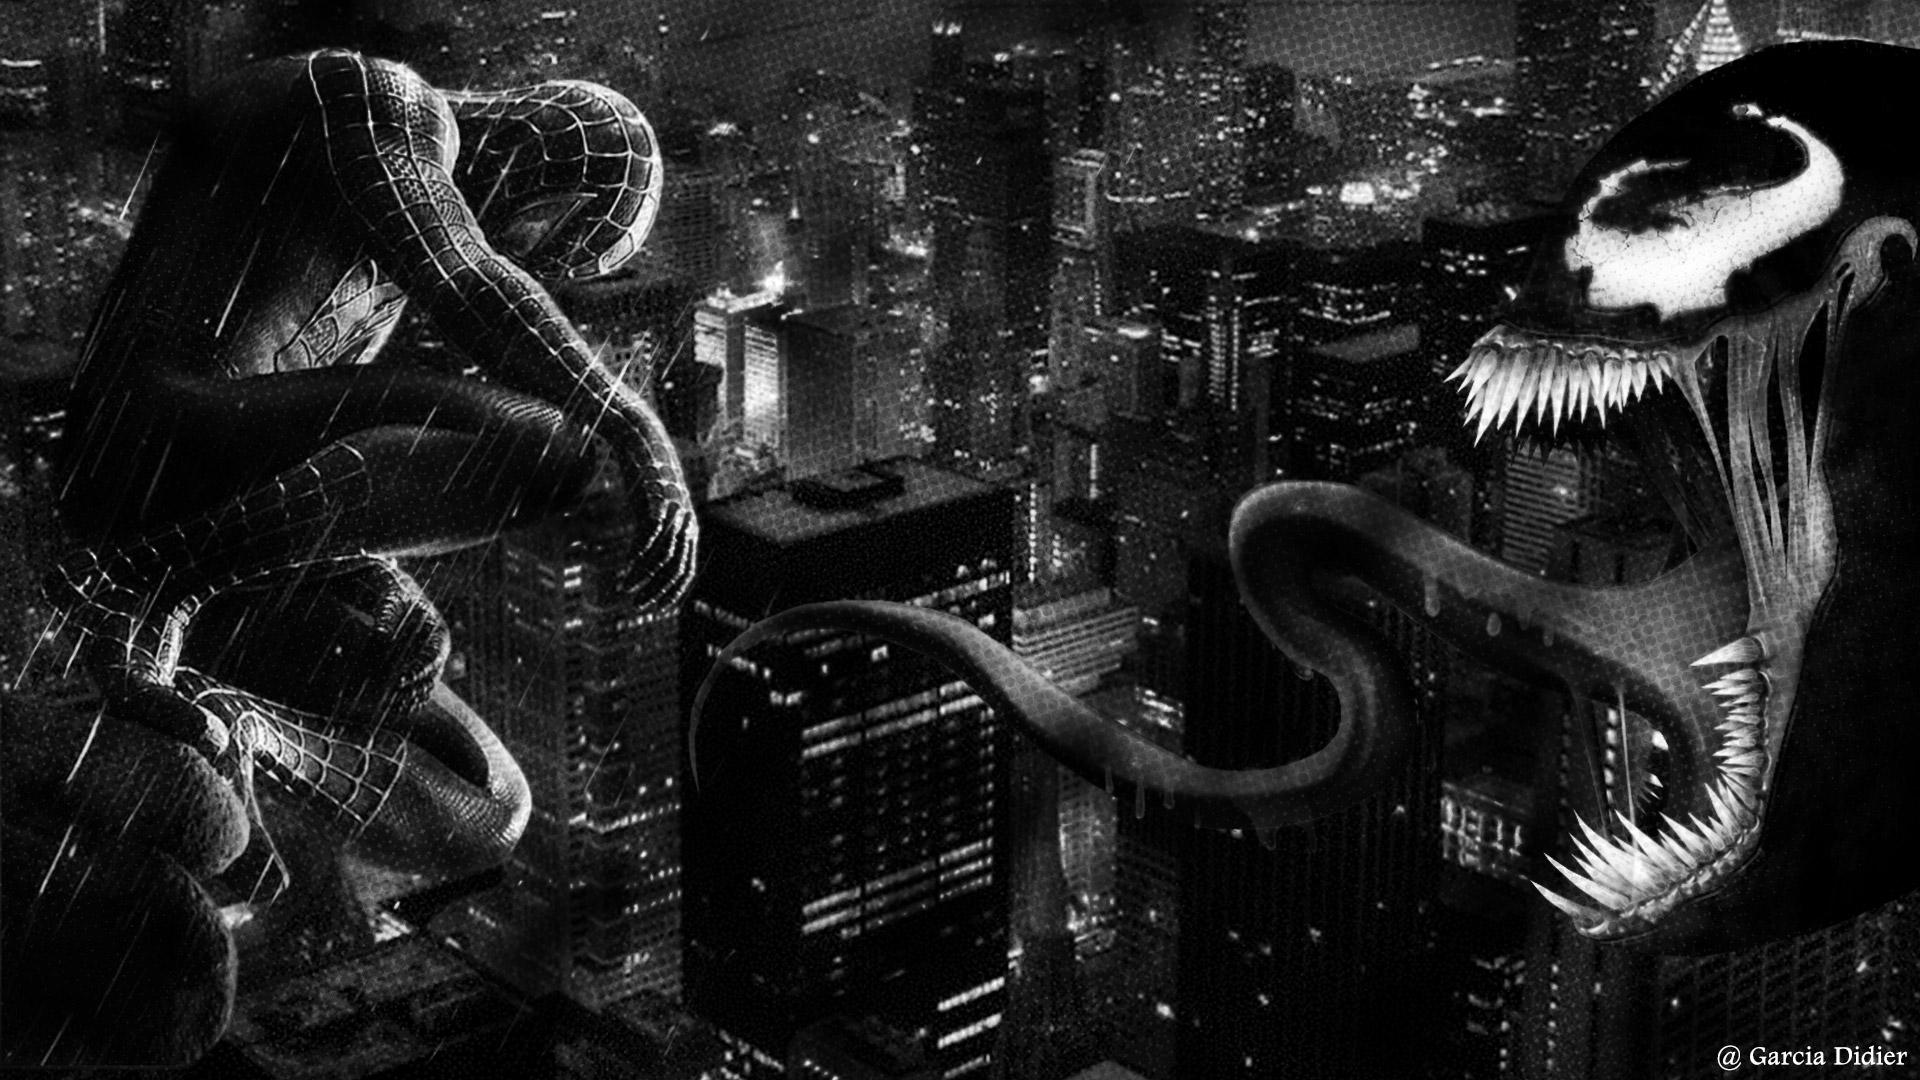 Fond ecran spiderman by dgarcia57 on deviantart for Fond decran style